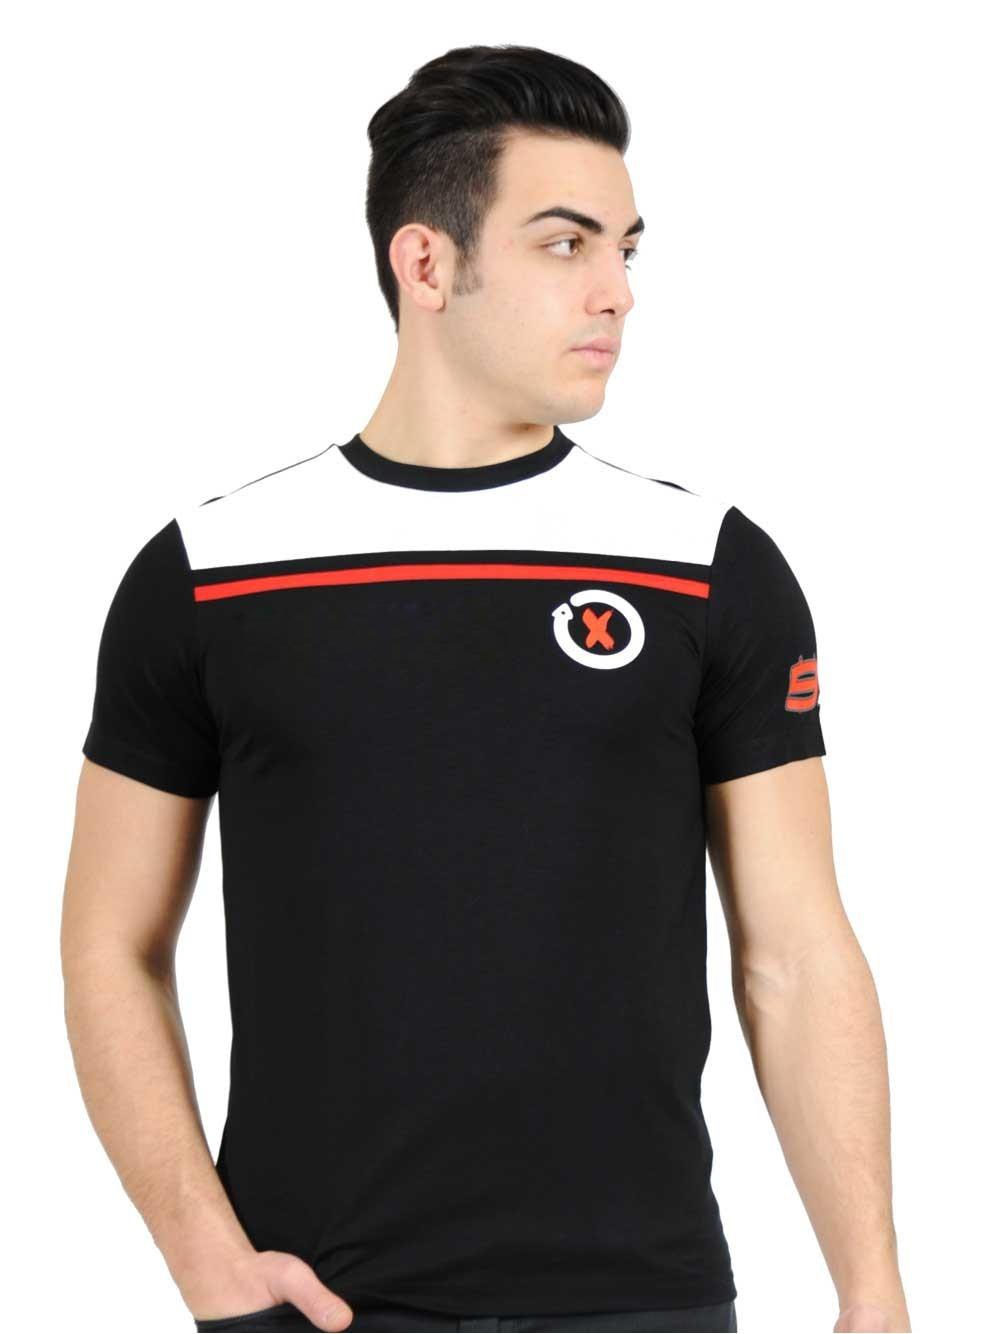 Camiseta de Moto gp locomotora de carreras Jorge Lorenzo 99 de algodón para Motocross de manga corta para hombre